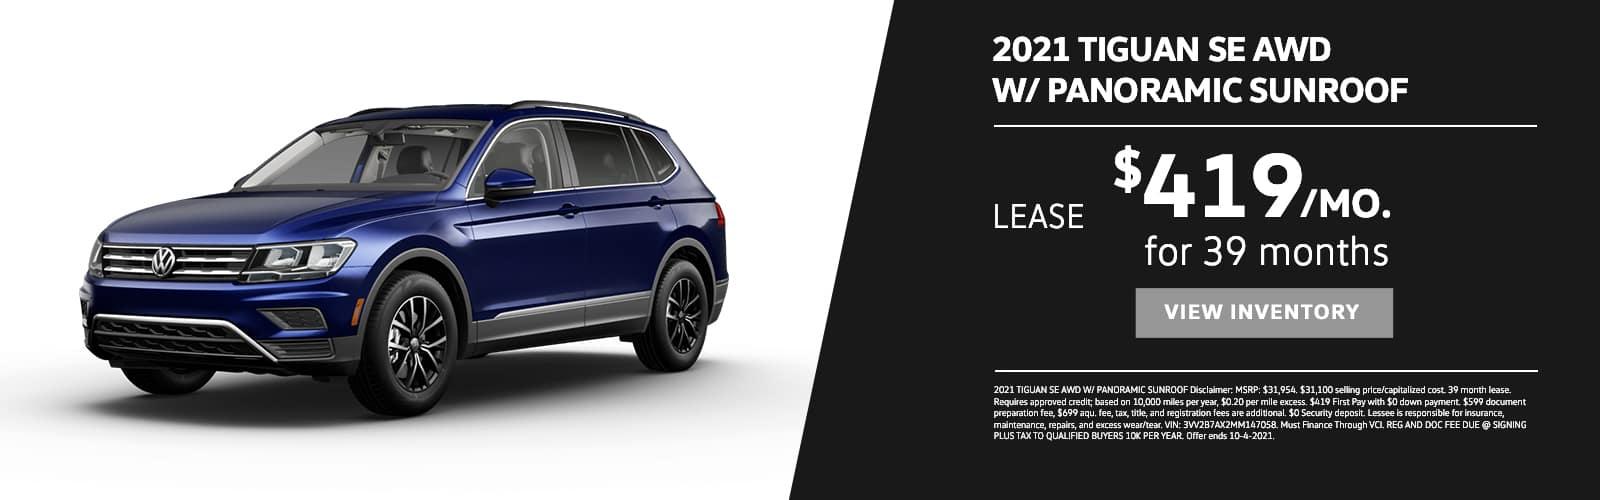 EAG_VW_2021 TIGUAN SE AWD W_ PANORAMIC SUNROOF